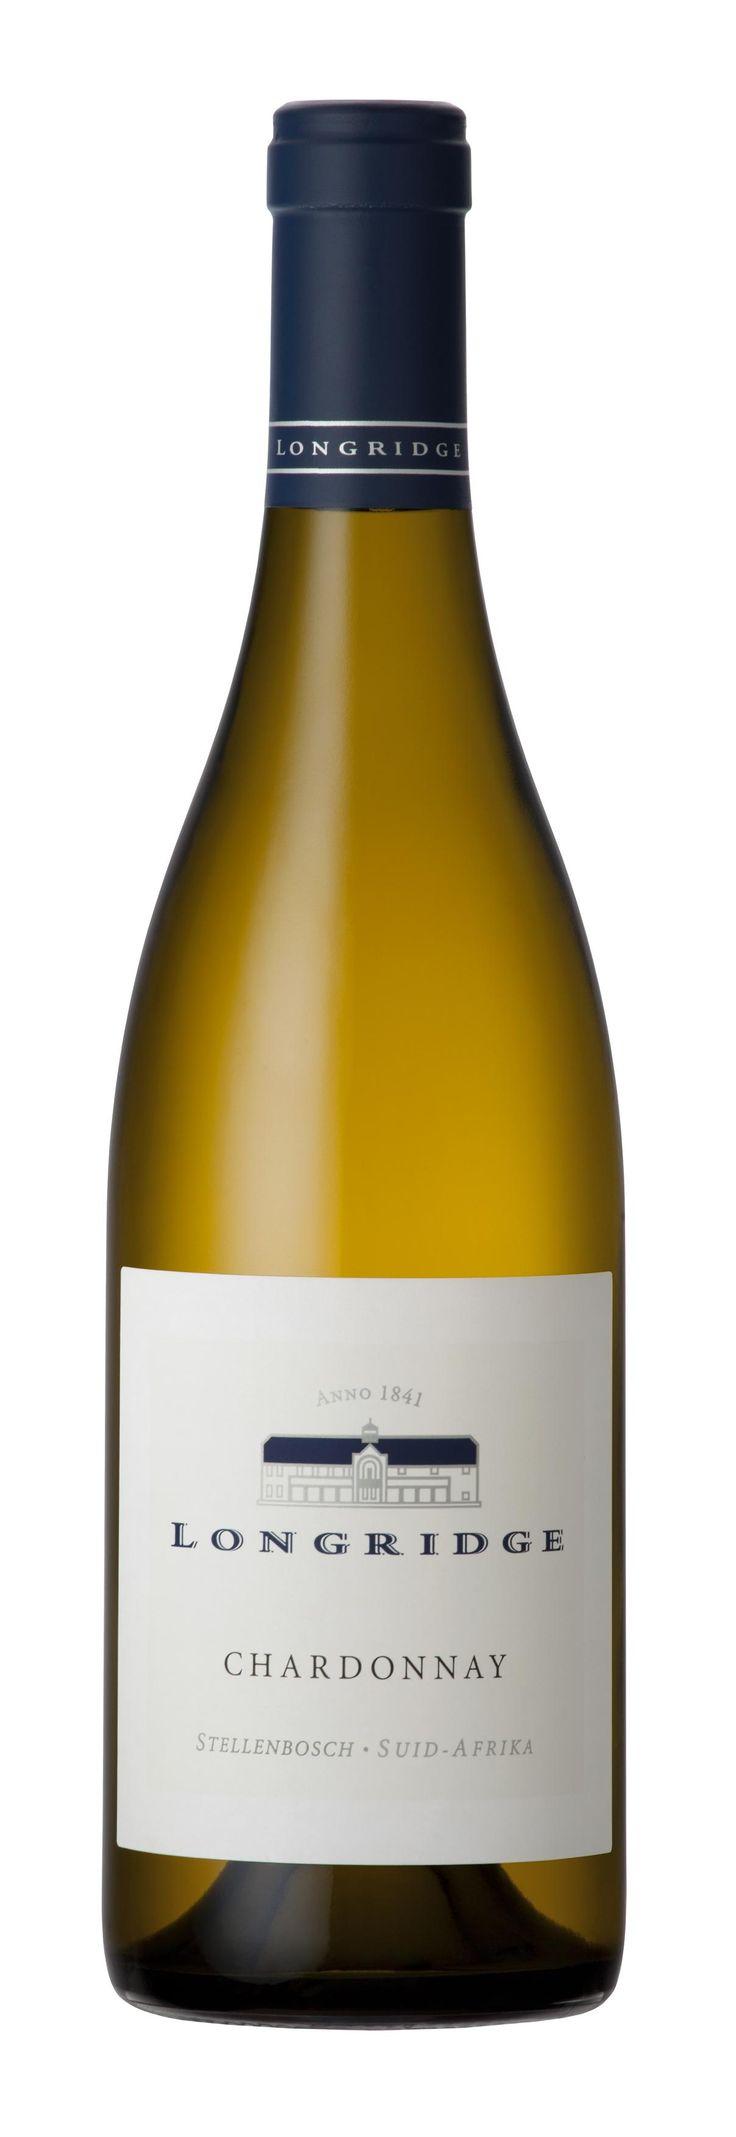 Longridge organic Chardonnay 2015 * Sommelier Selection 2016*